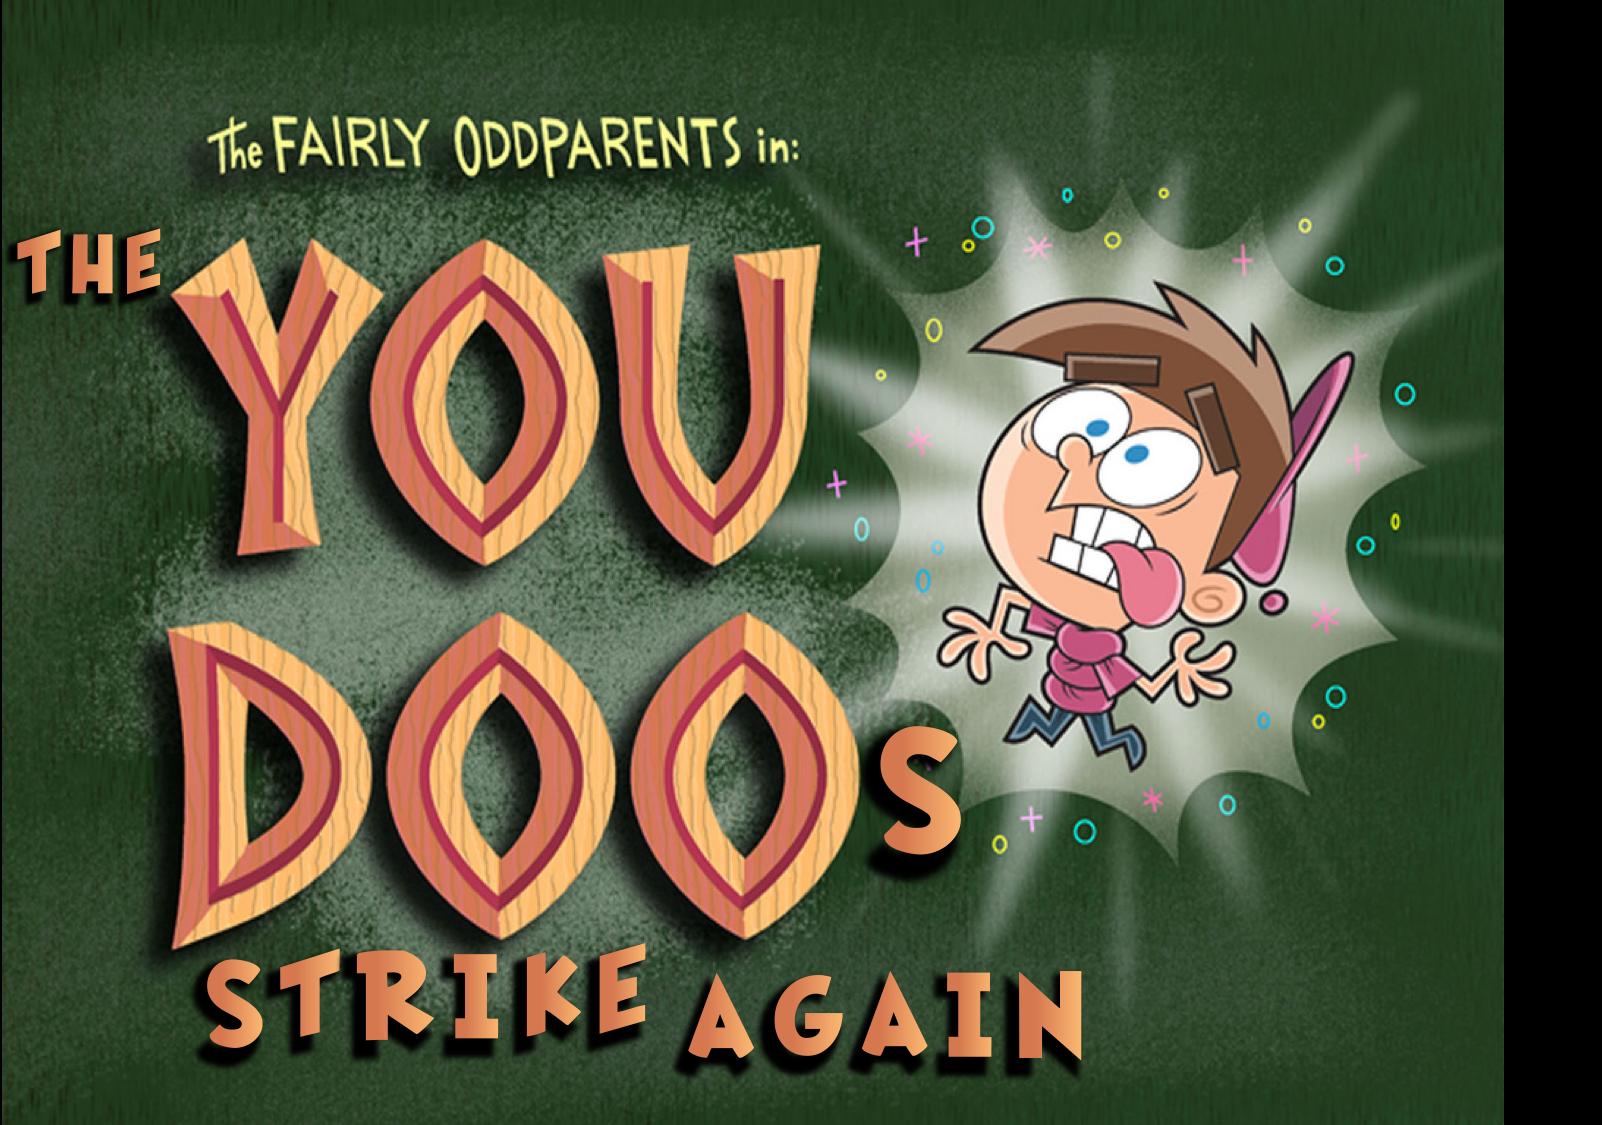 List of Fairly OddFanon Episodes